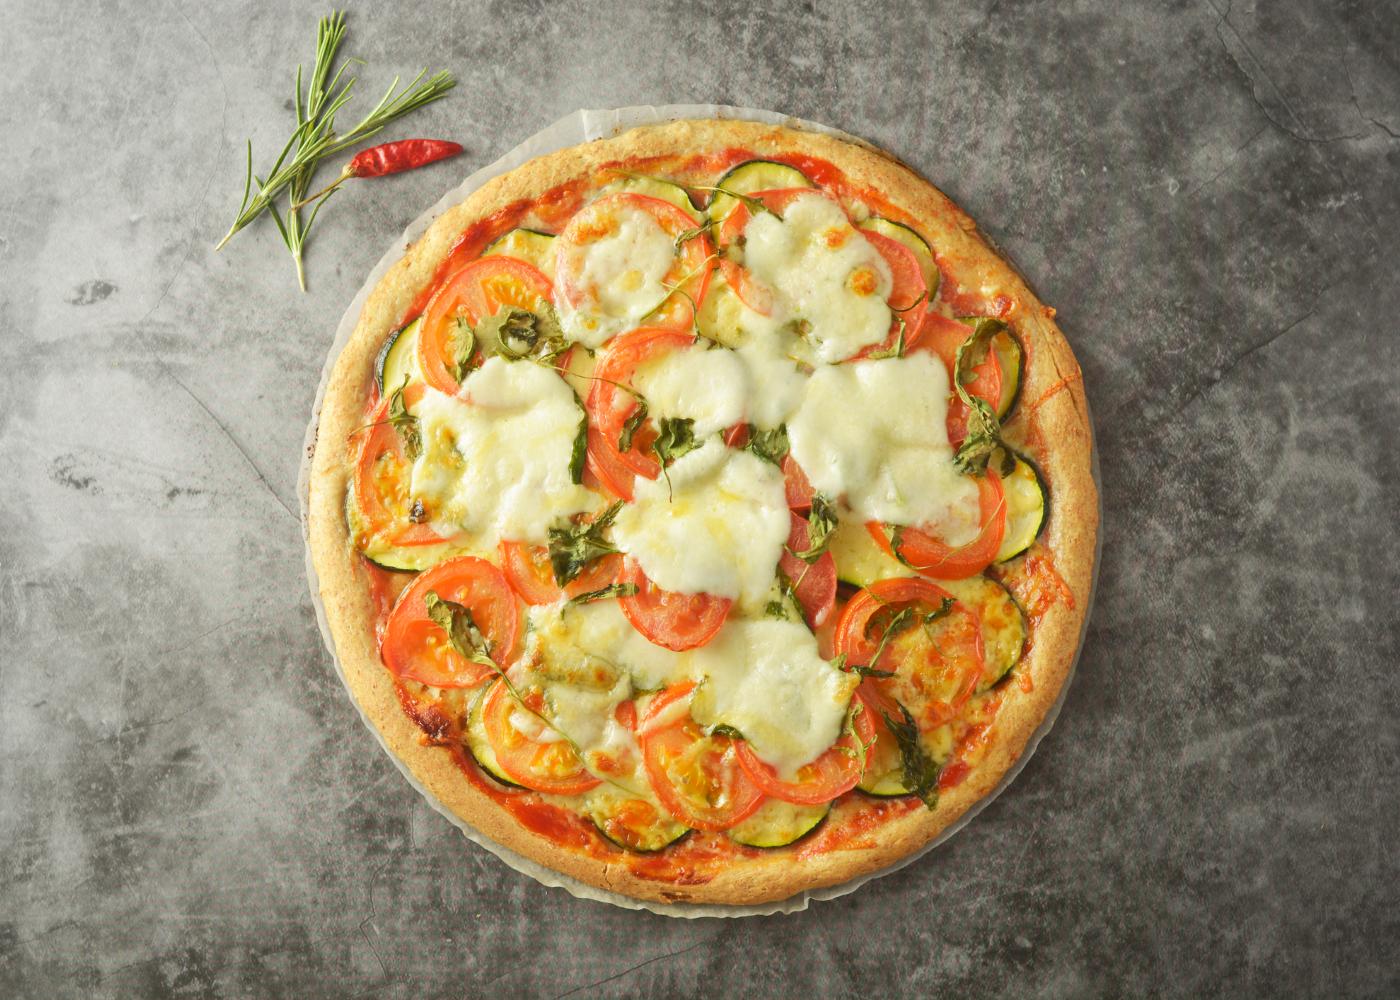 pizza com massa integral com tomate e curgete